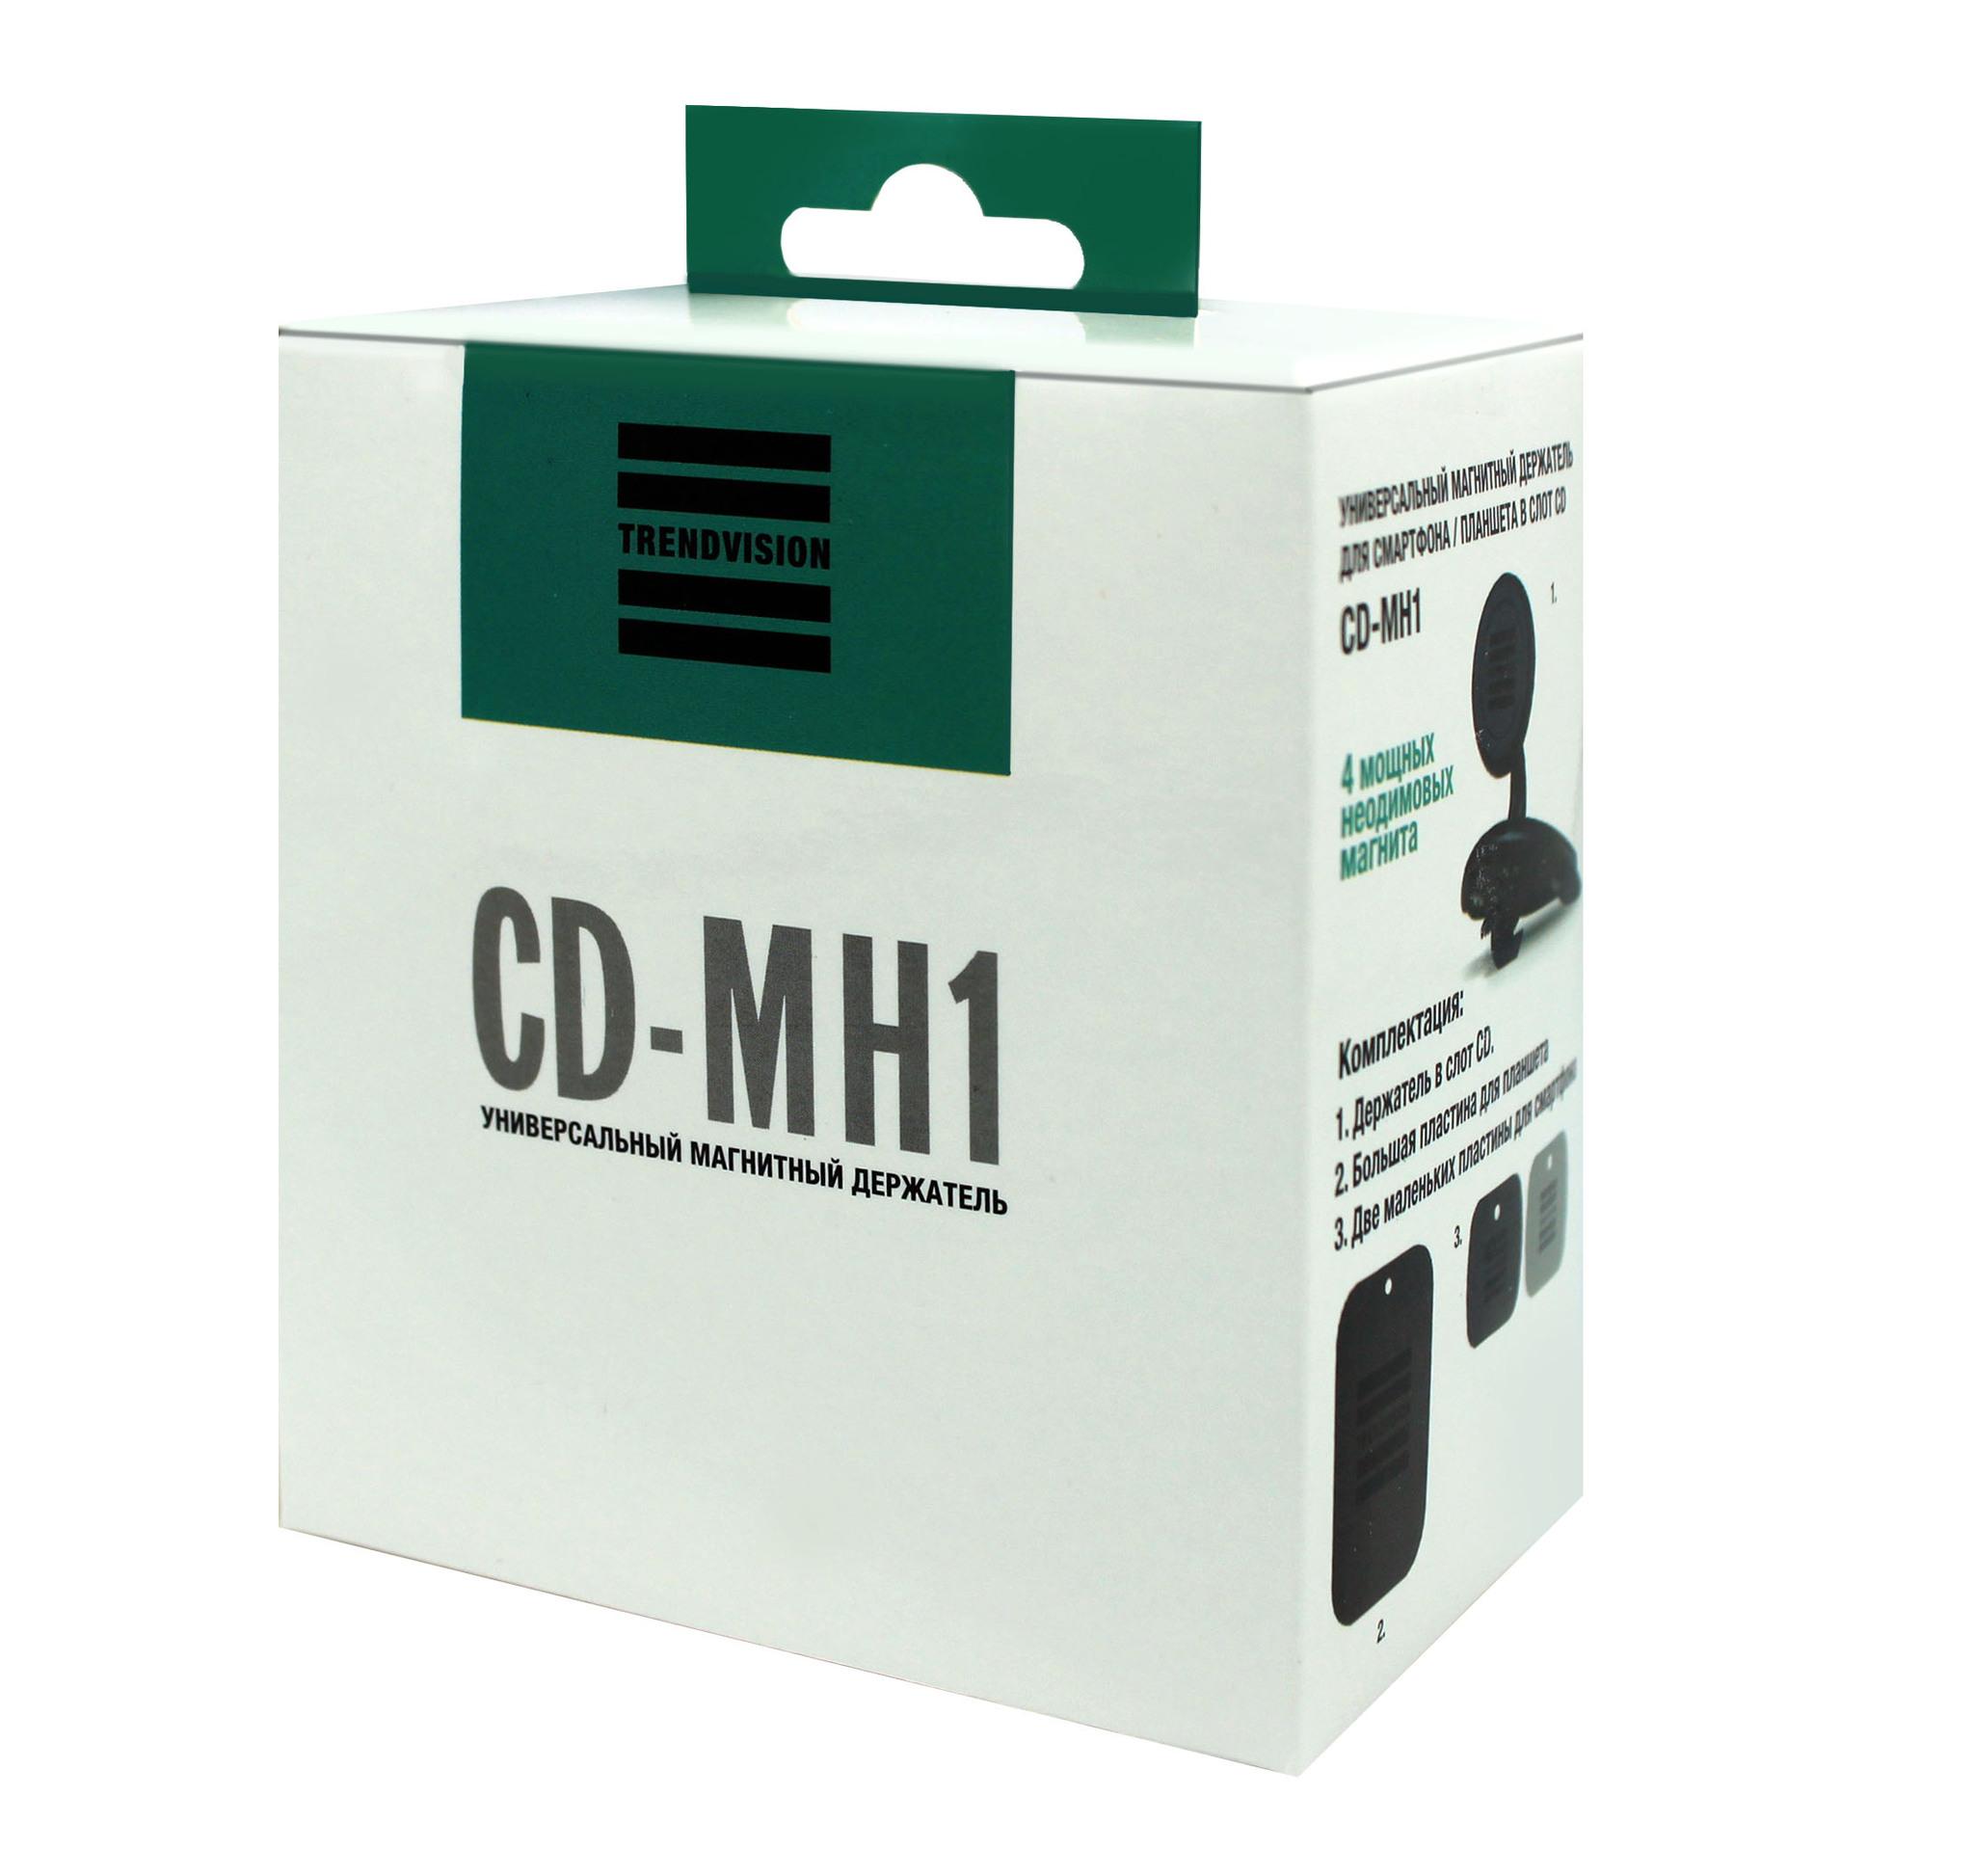 TrendVision CD-MH1